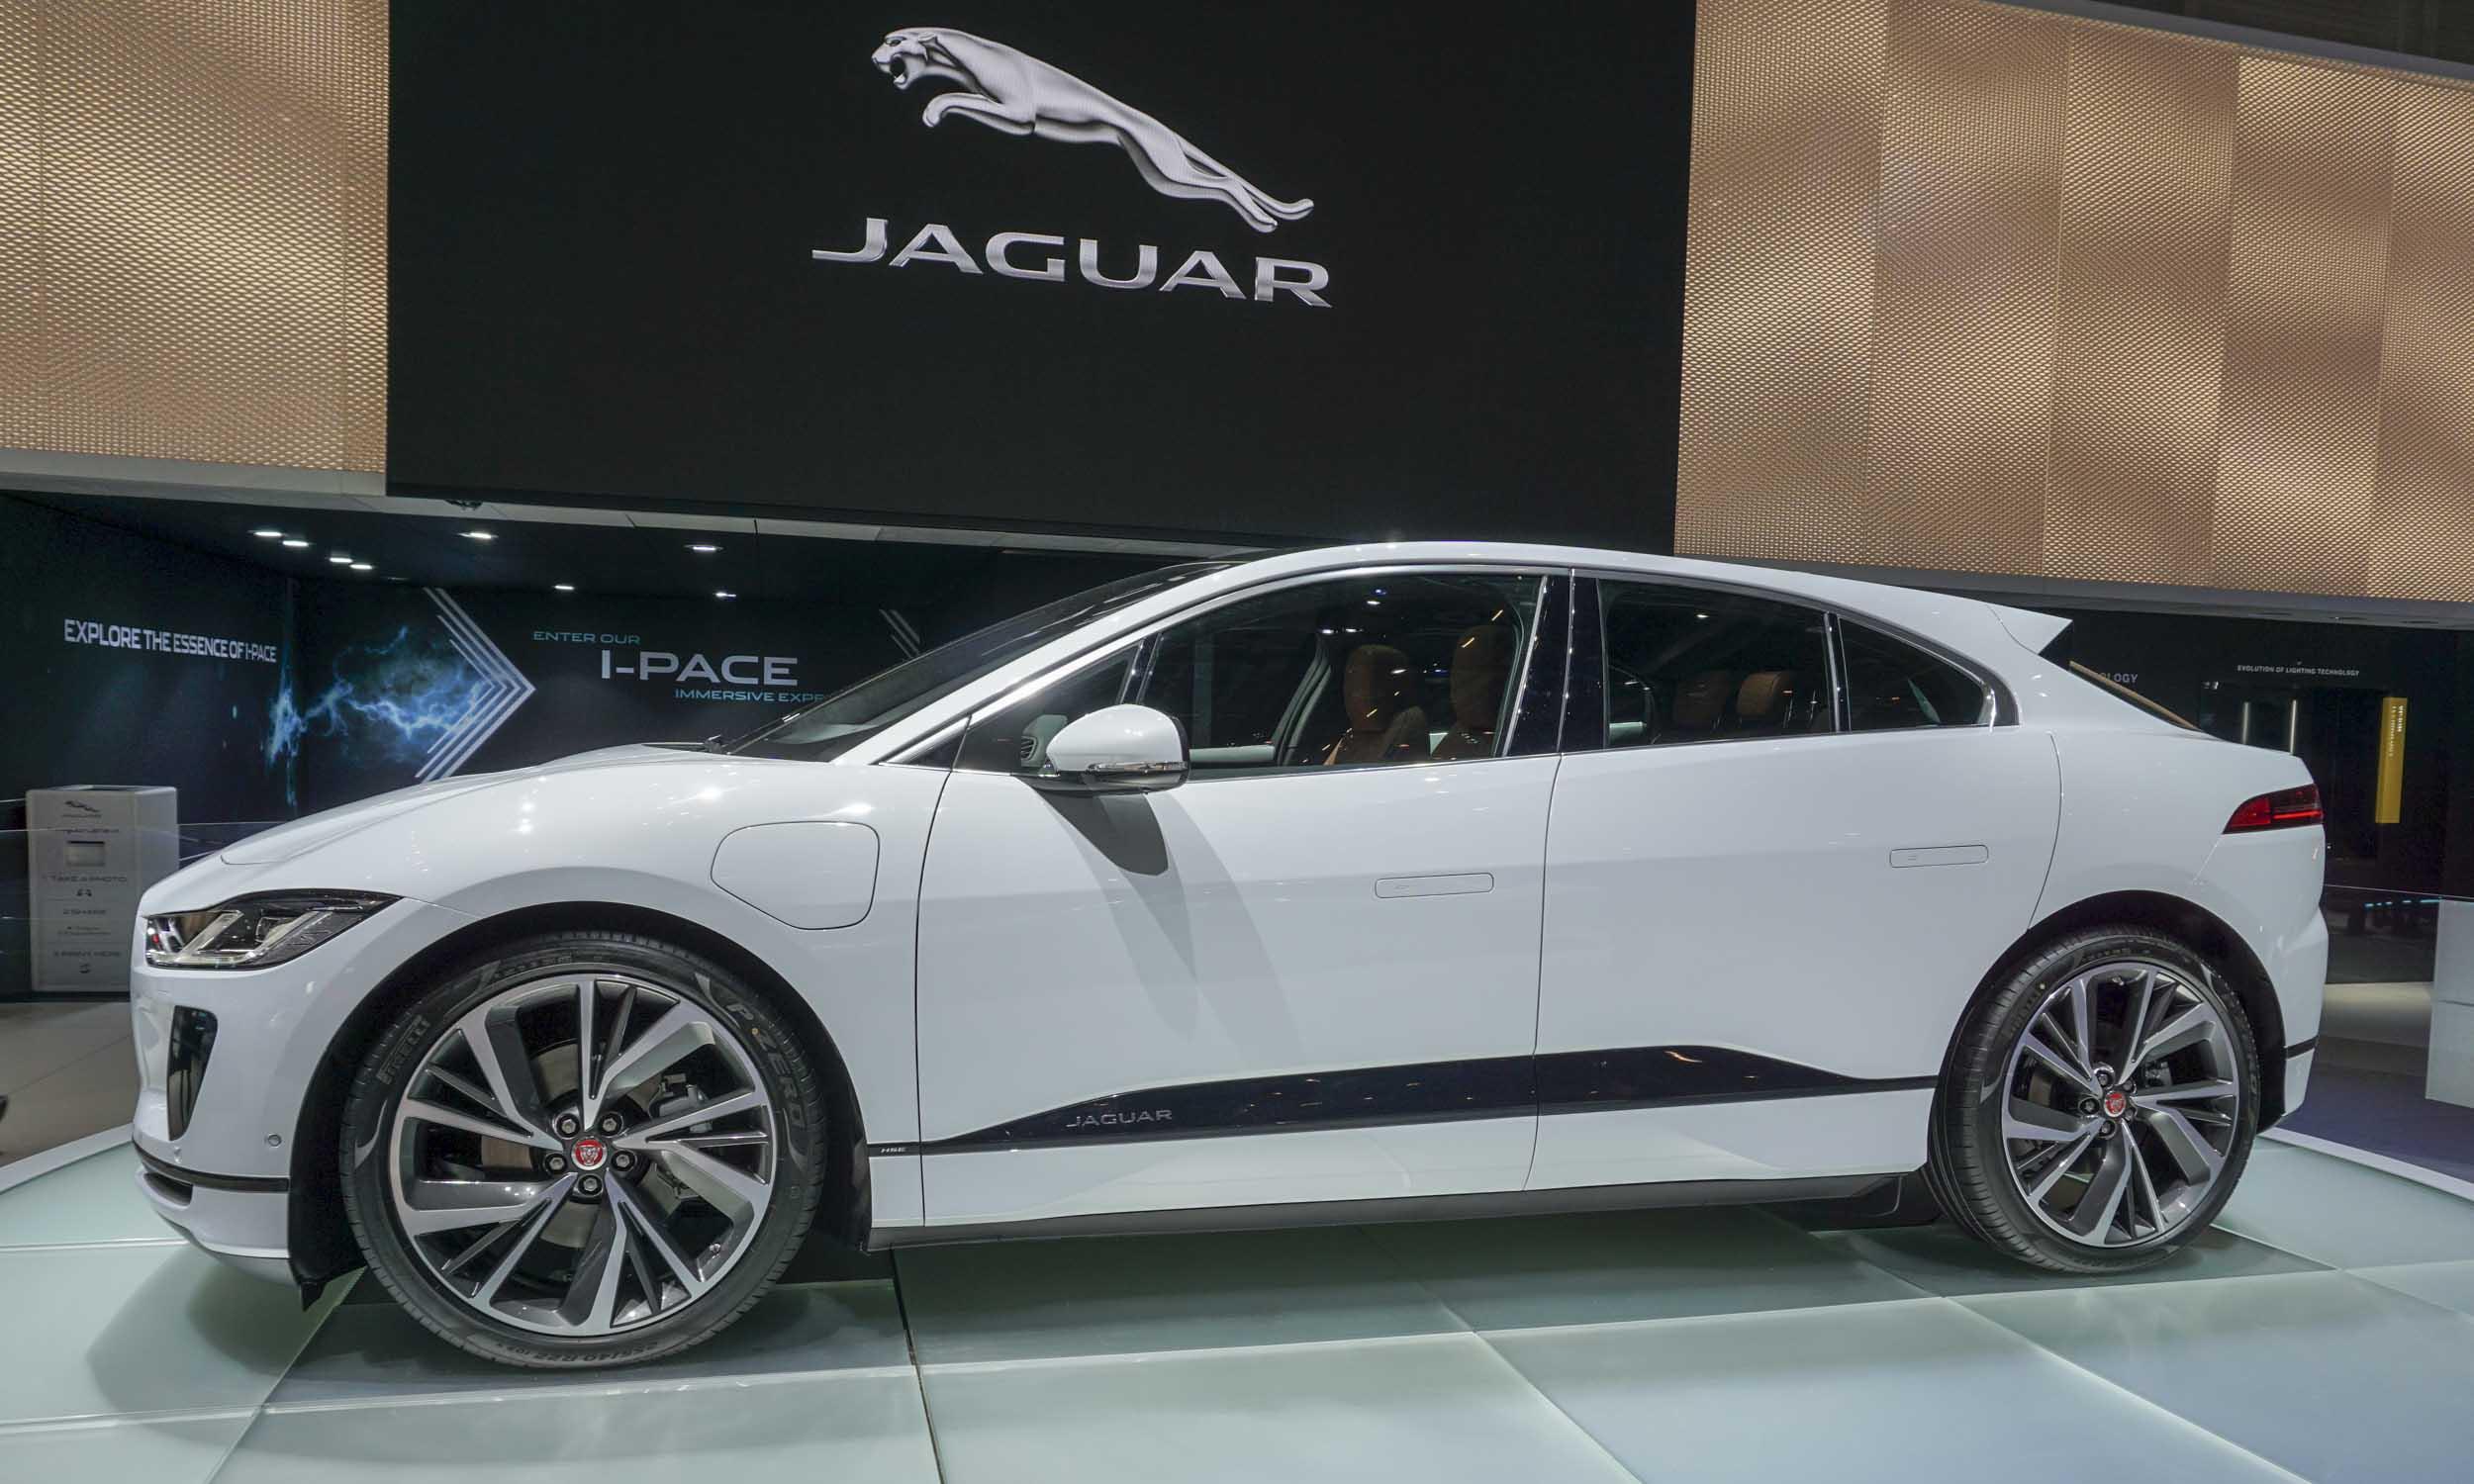 car la angeles dealership news l xk continuation cars jaguar los prototype restores speed a top xkss ss in previews million